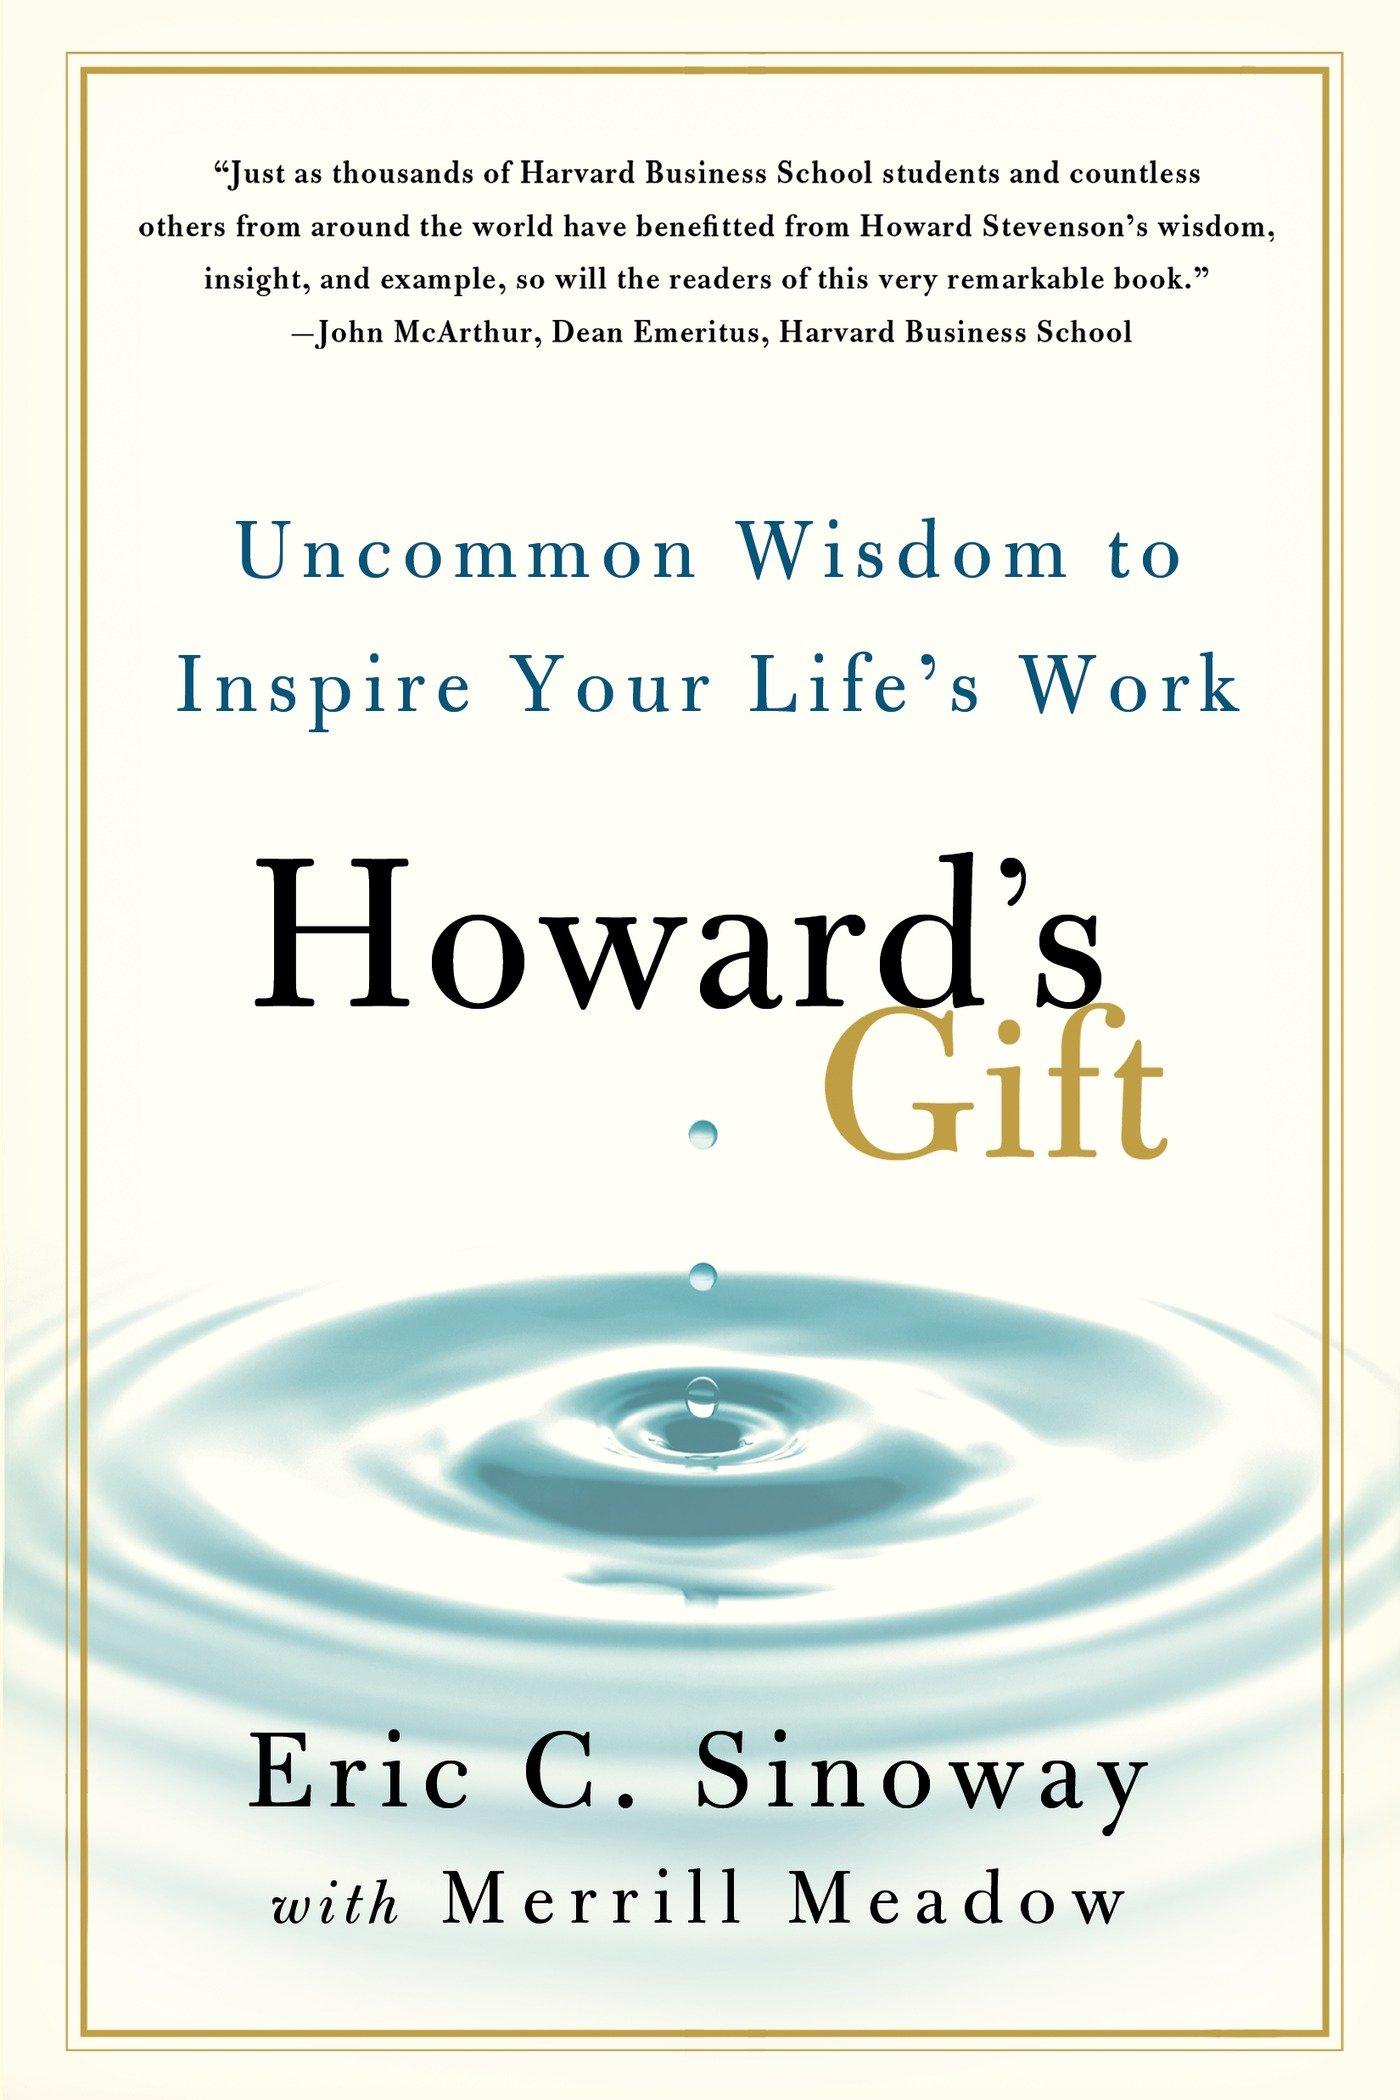 Howards Gift Uncommon Wisdom Inspire product image